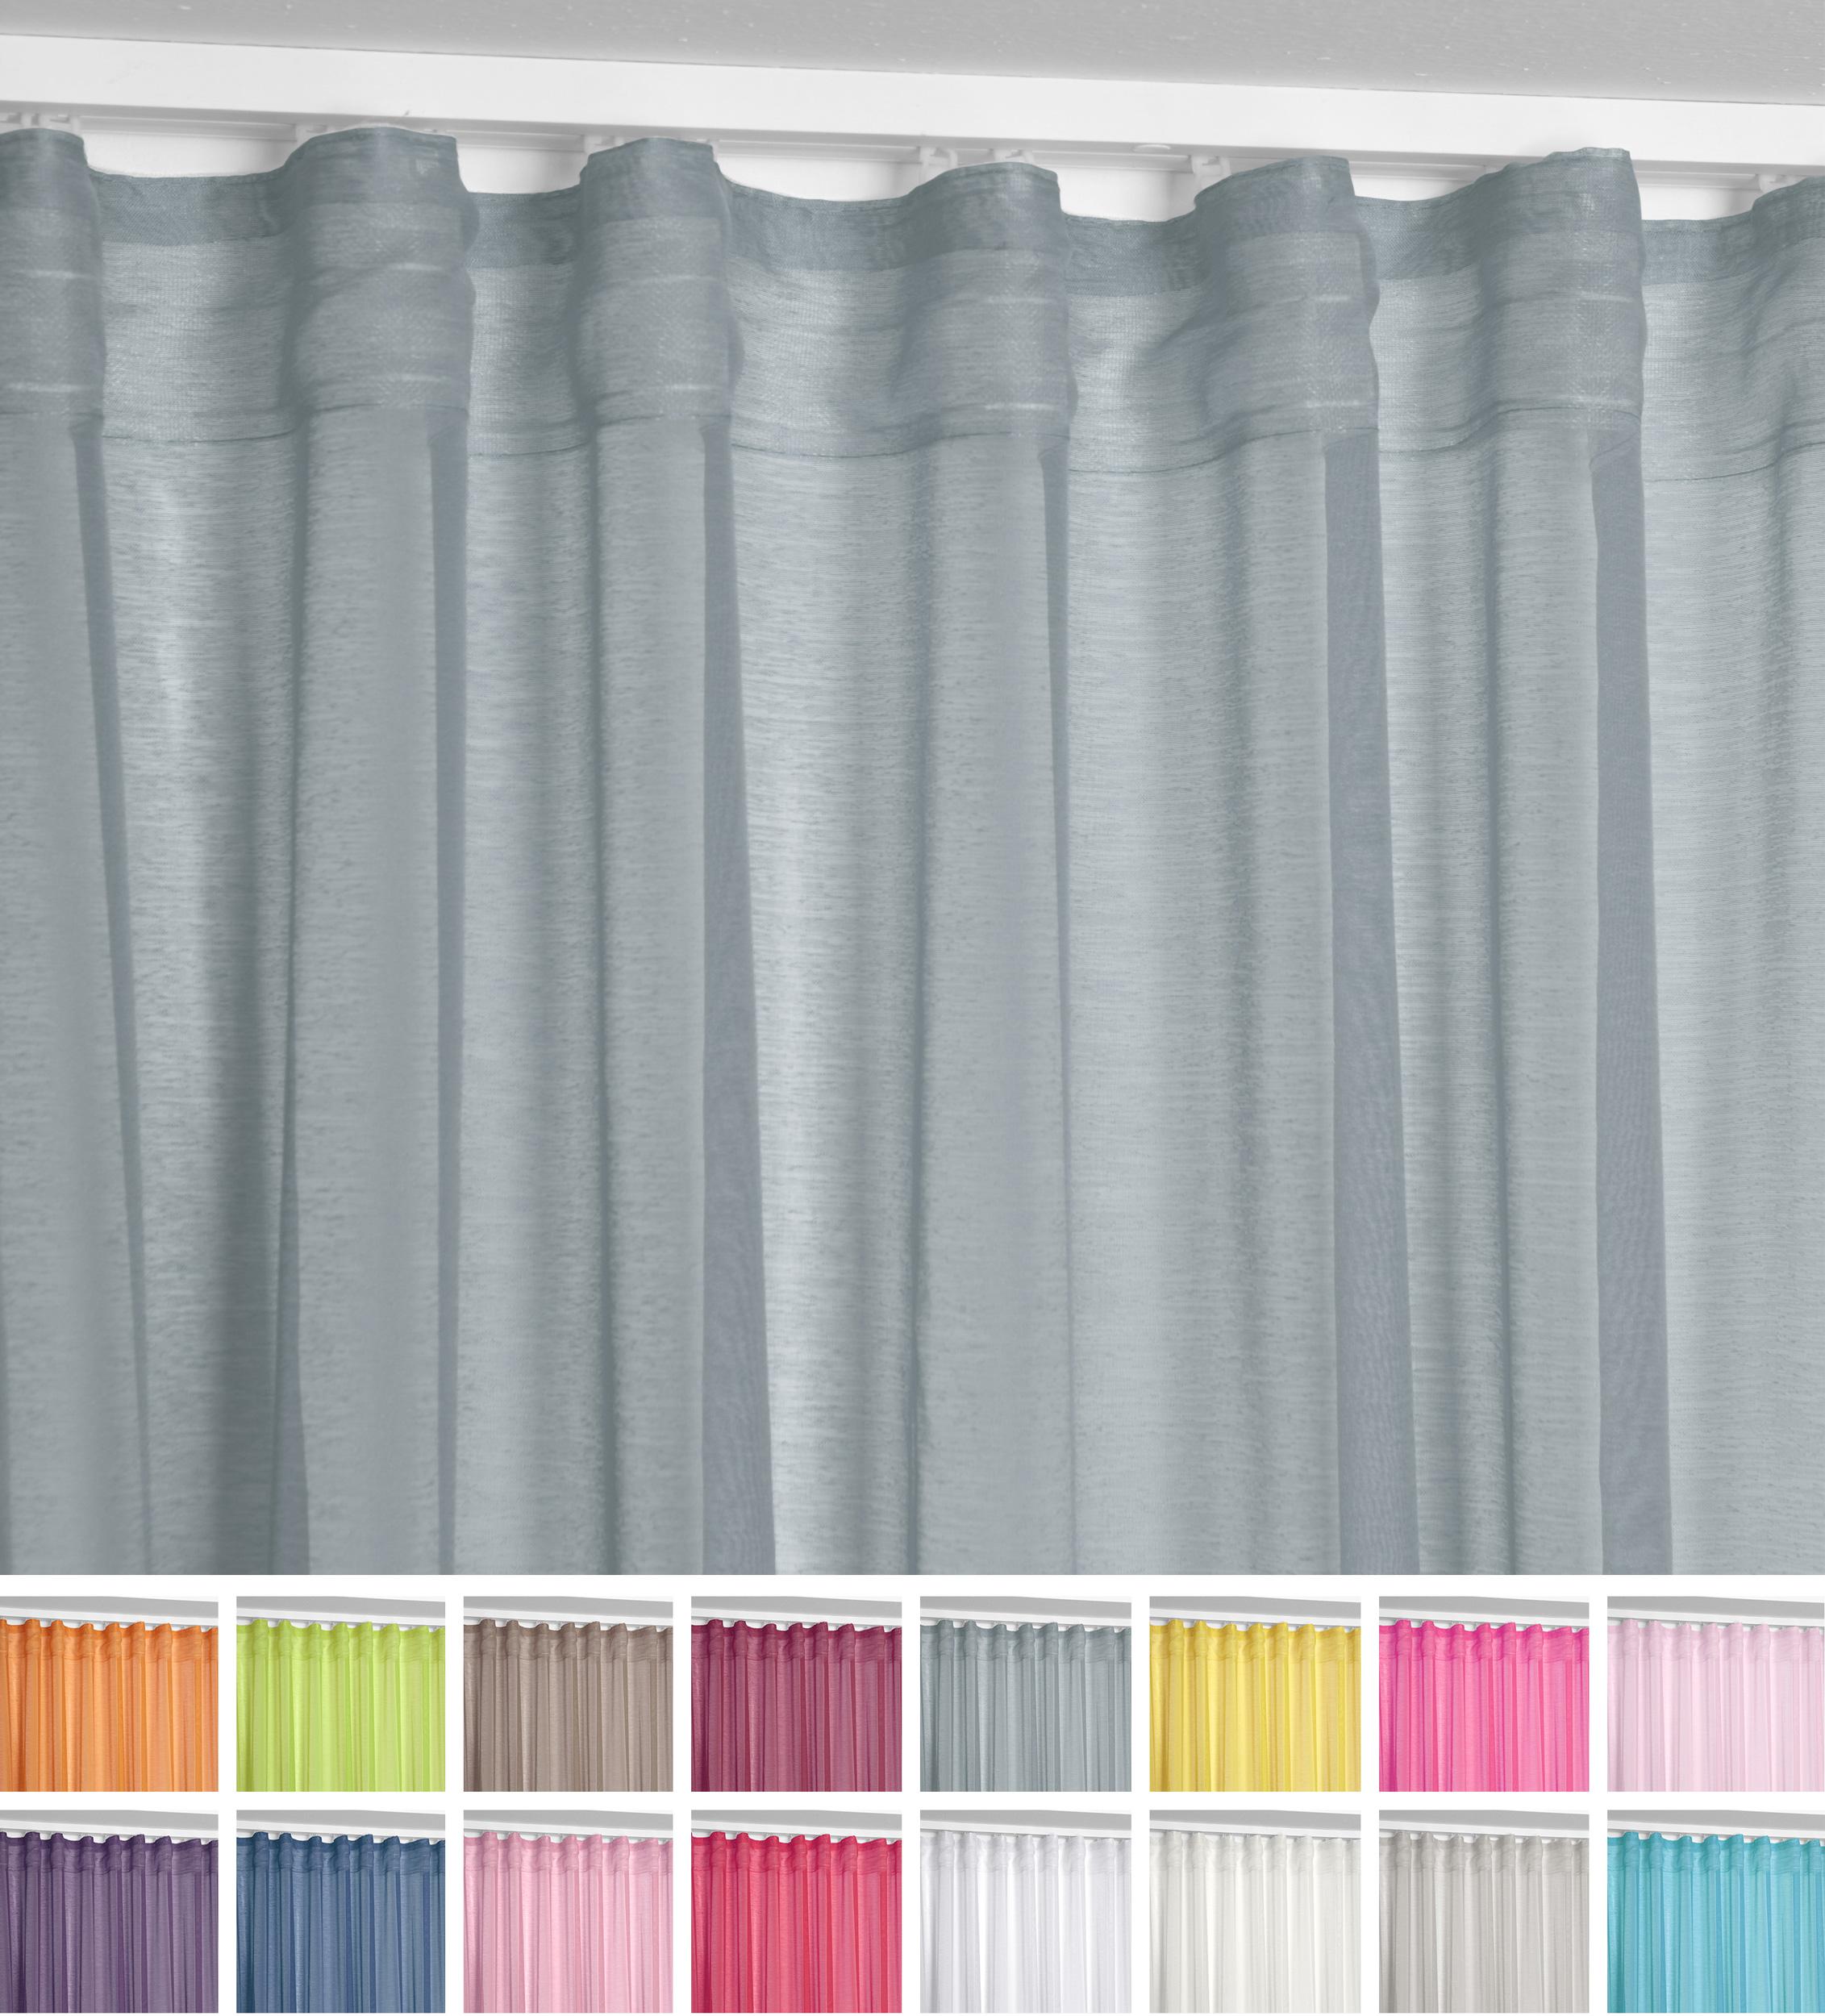 Beautex Vorhang Mit U Band 140x250 Cm Farbe Wählbar Transparente Kräuselband Gardine Dolly